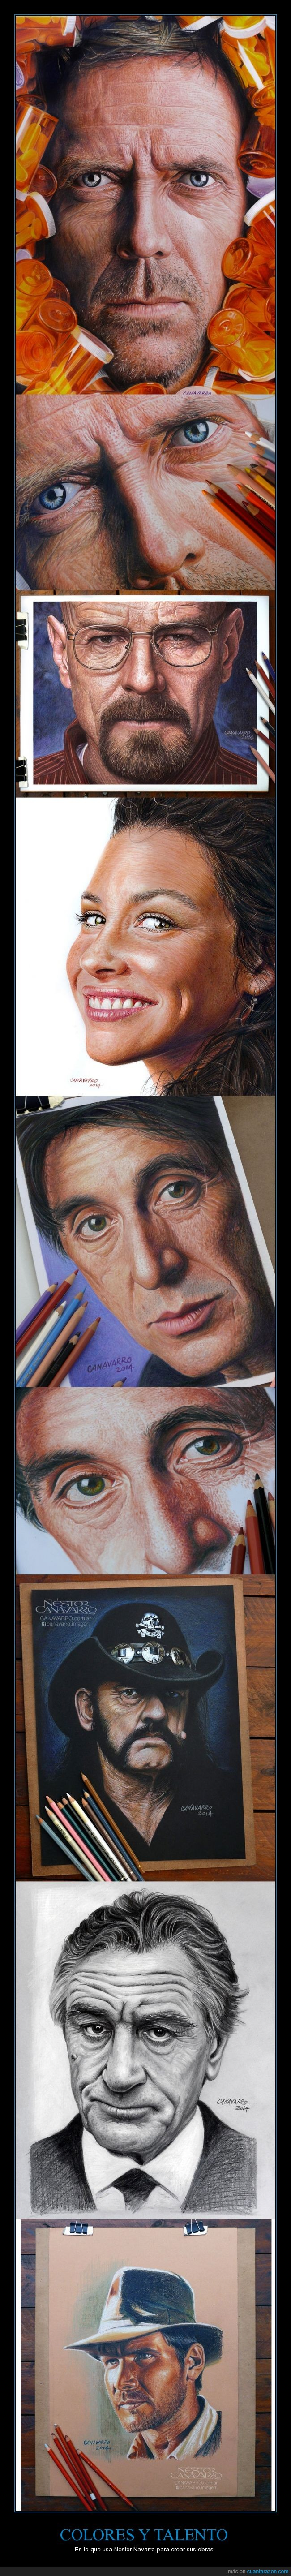 Al Pacino,Evangeline Lily,hiperrealismo,hiperrealista,Hugh LAurie,Indiana Jones,Nestor Navarro,Robert deniro